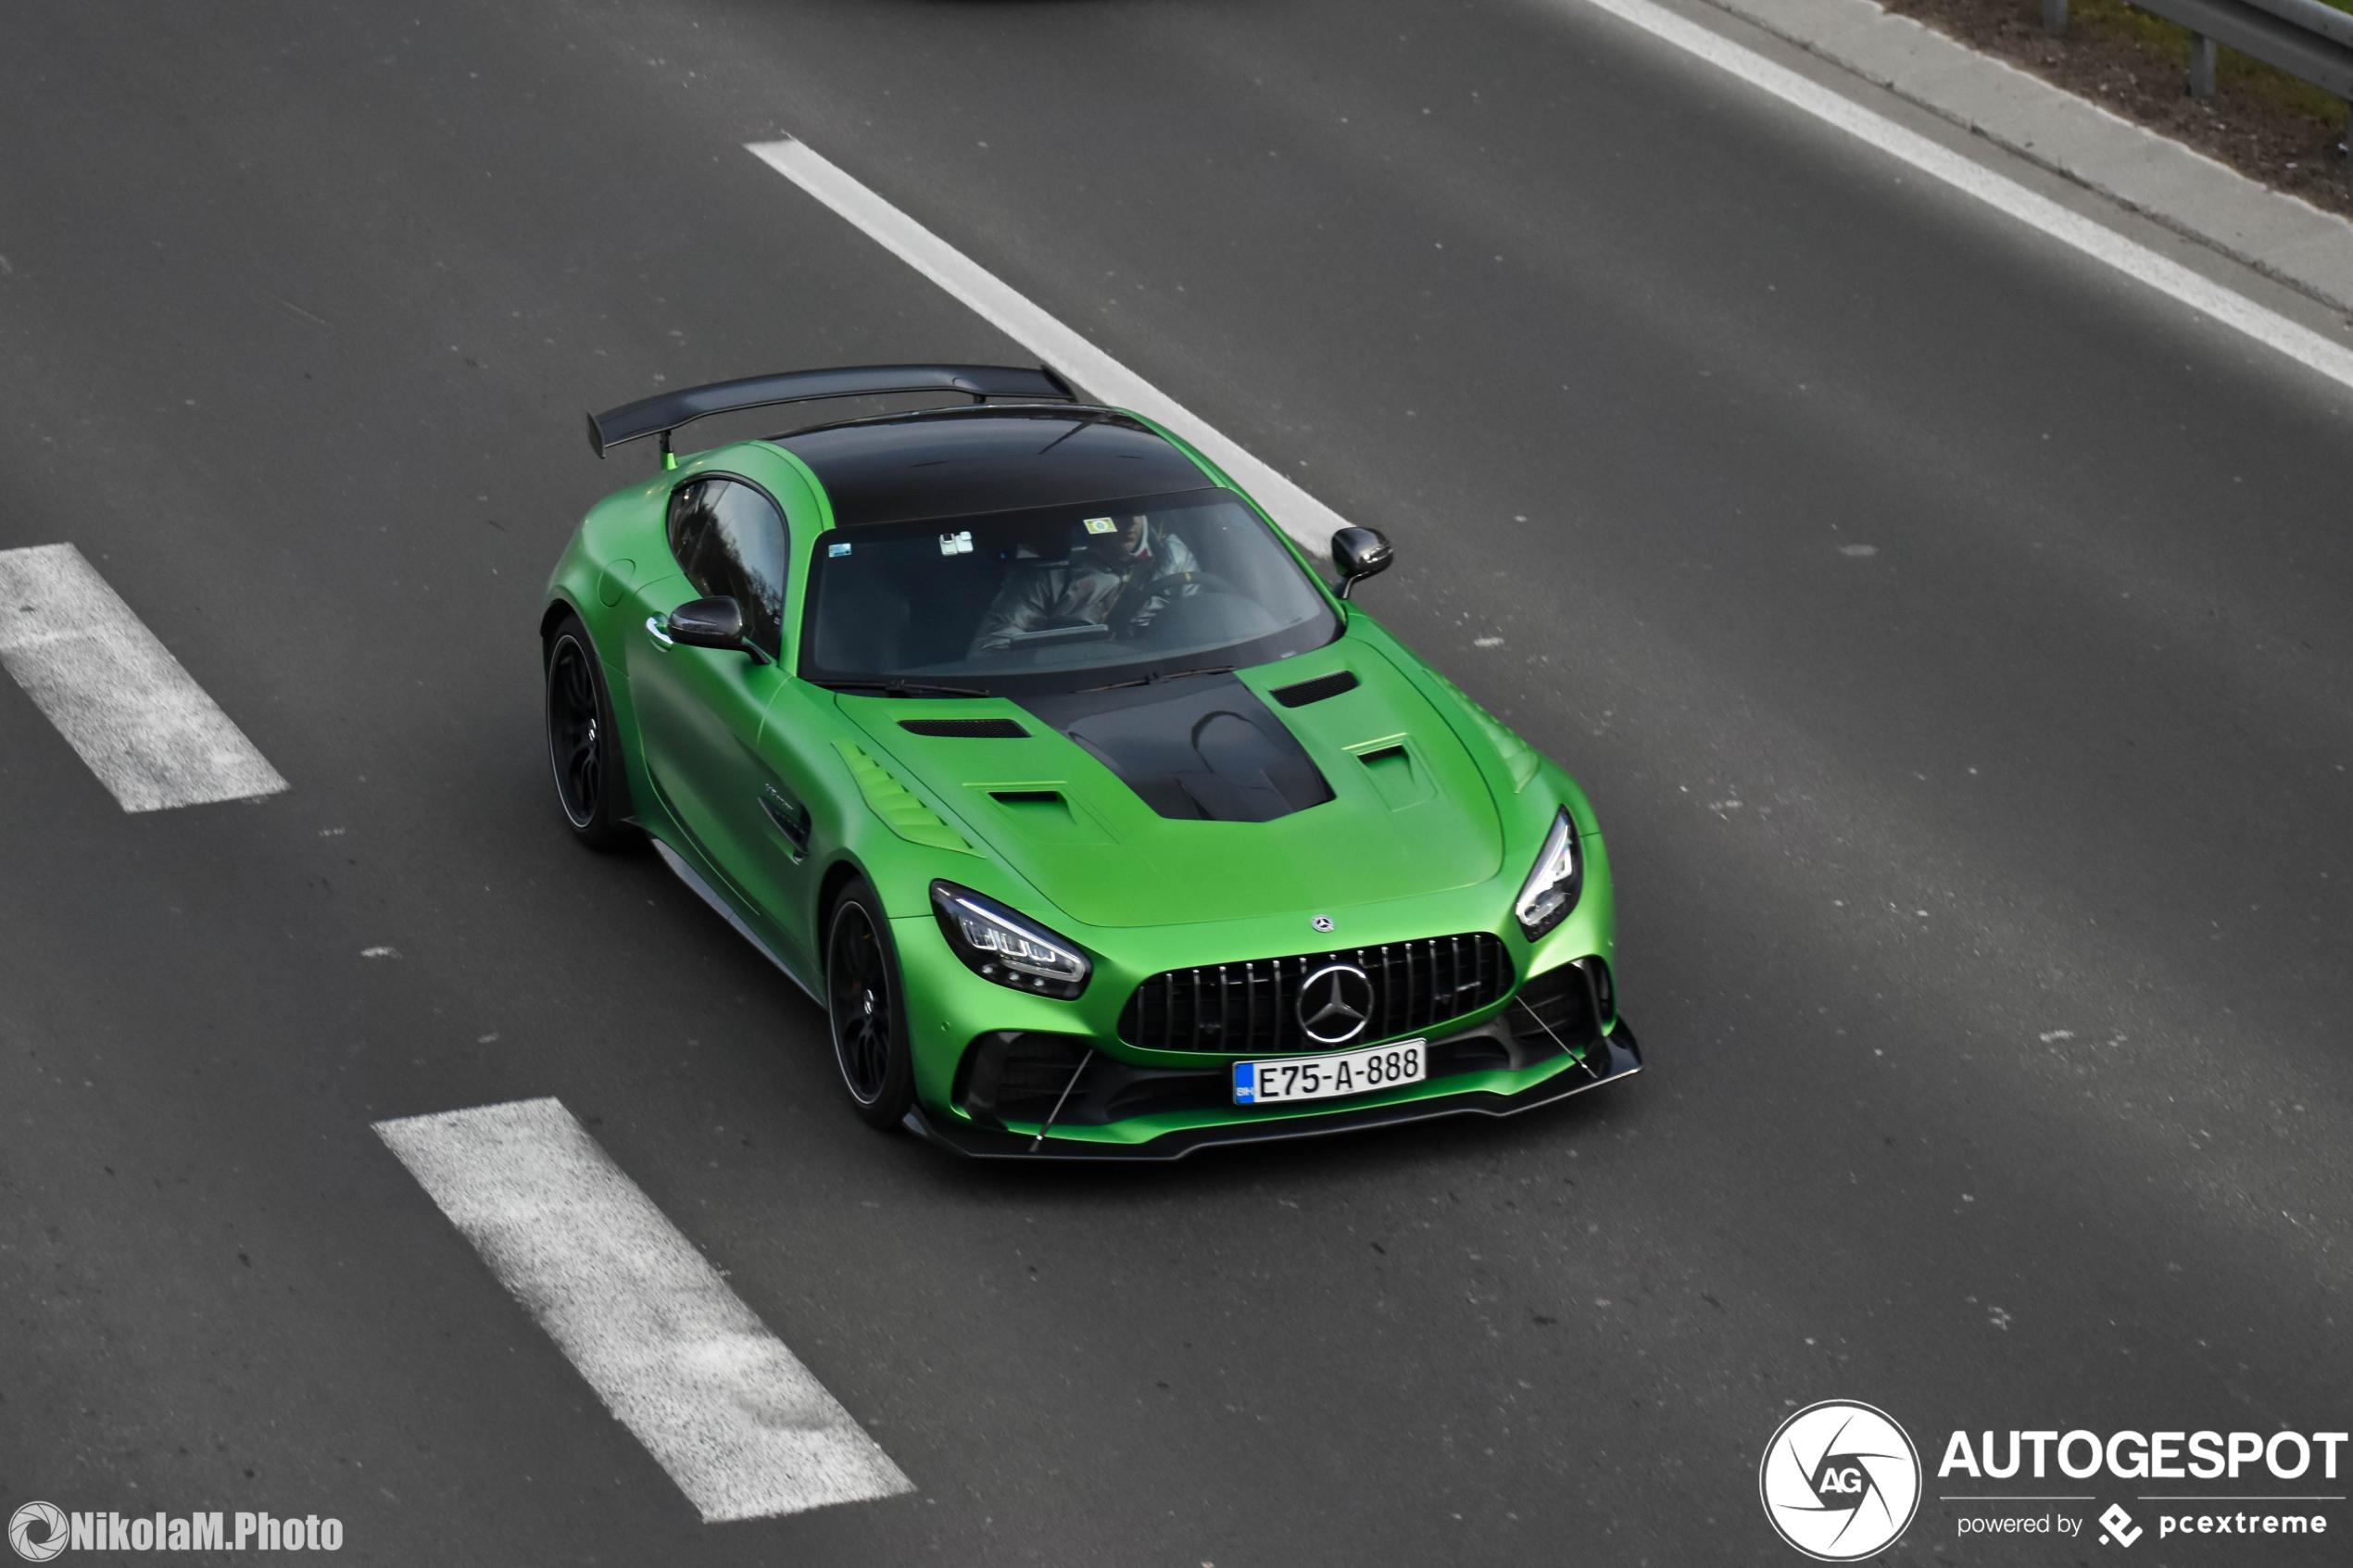 Mercedes-AMG GT R C190 Tikt Performance